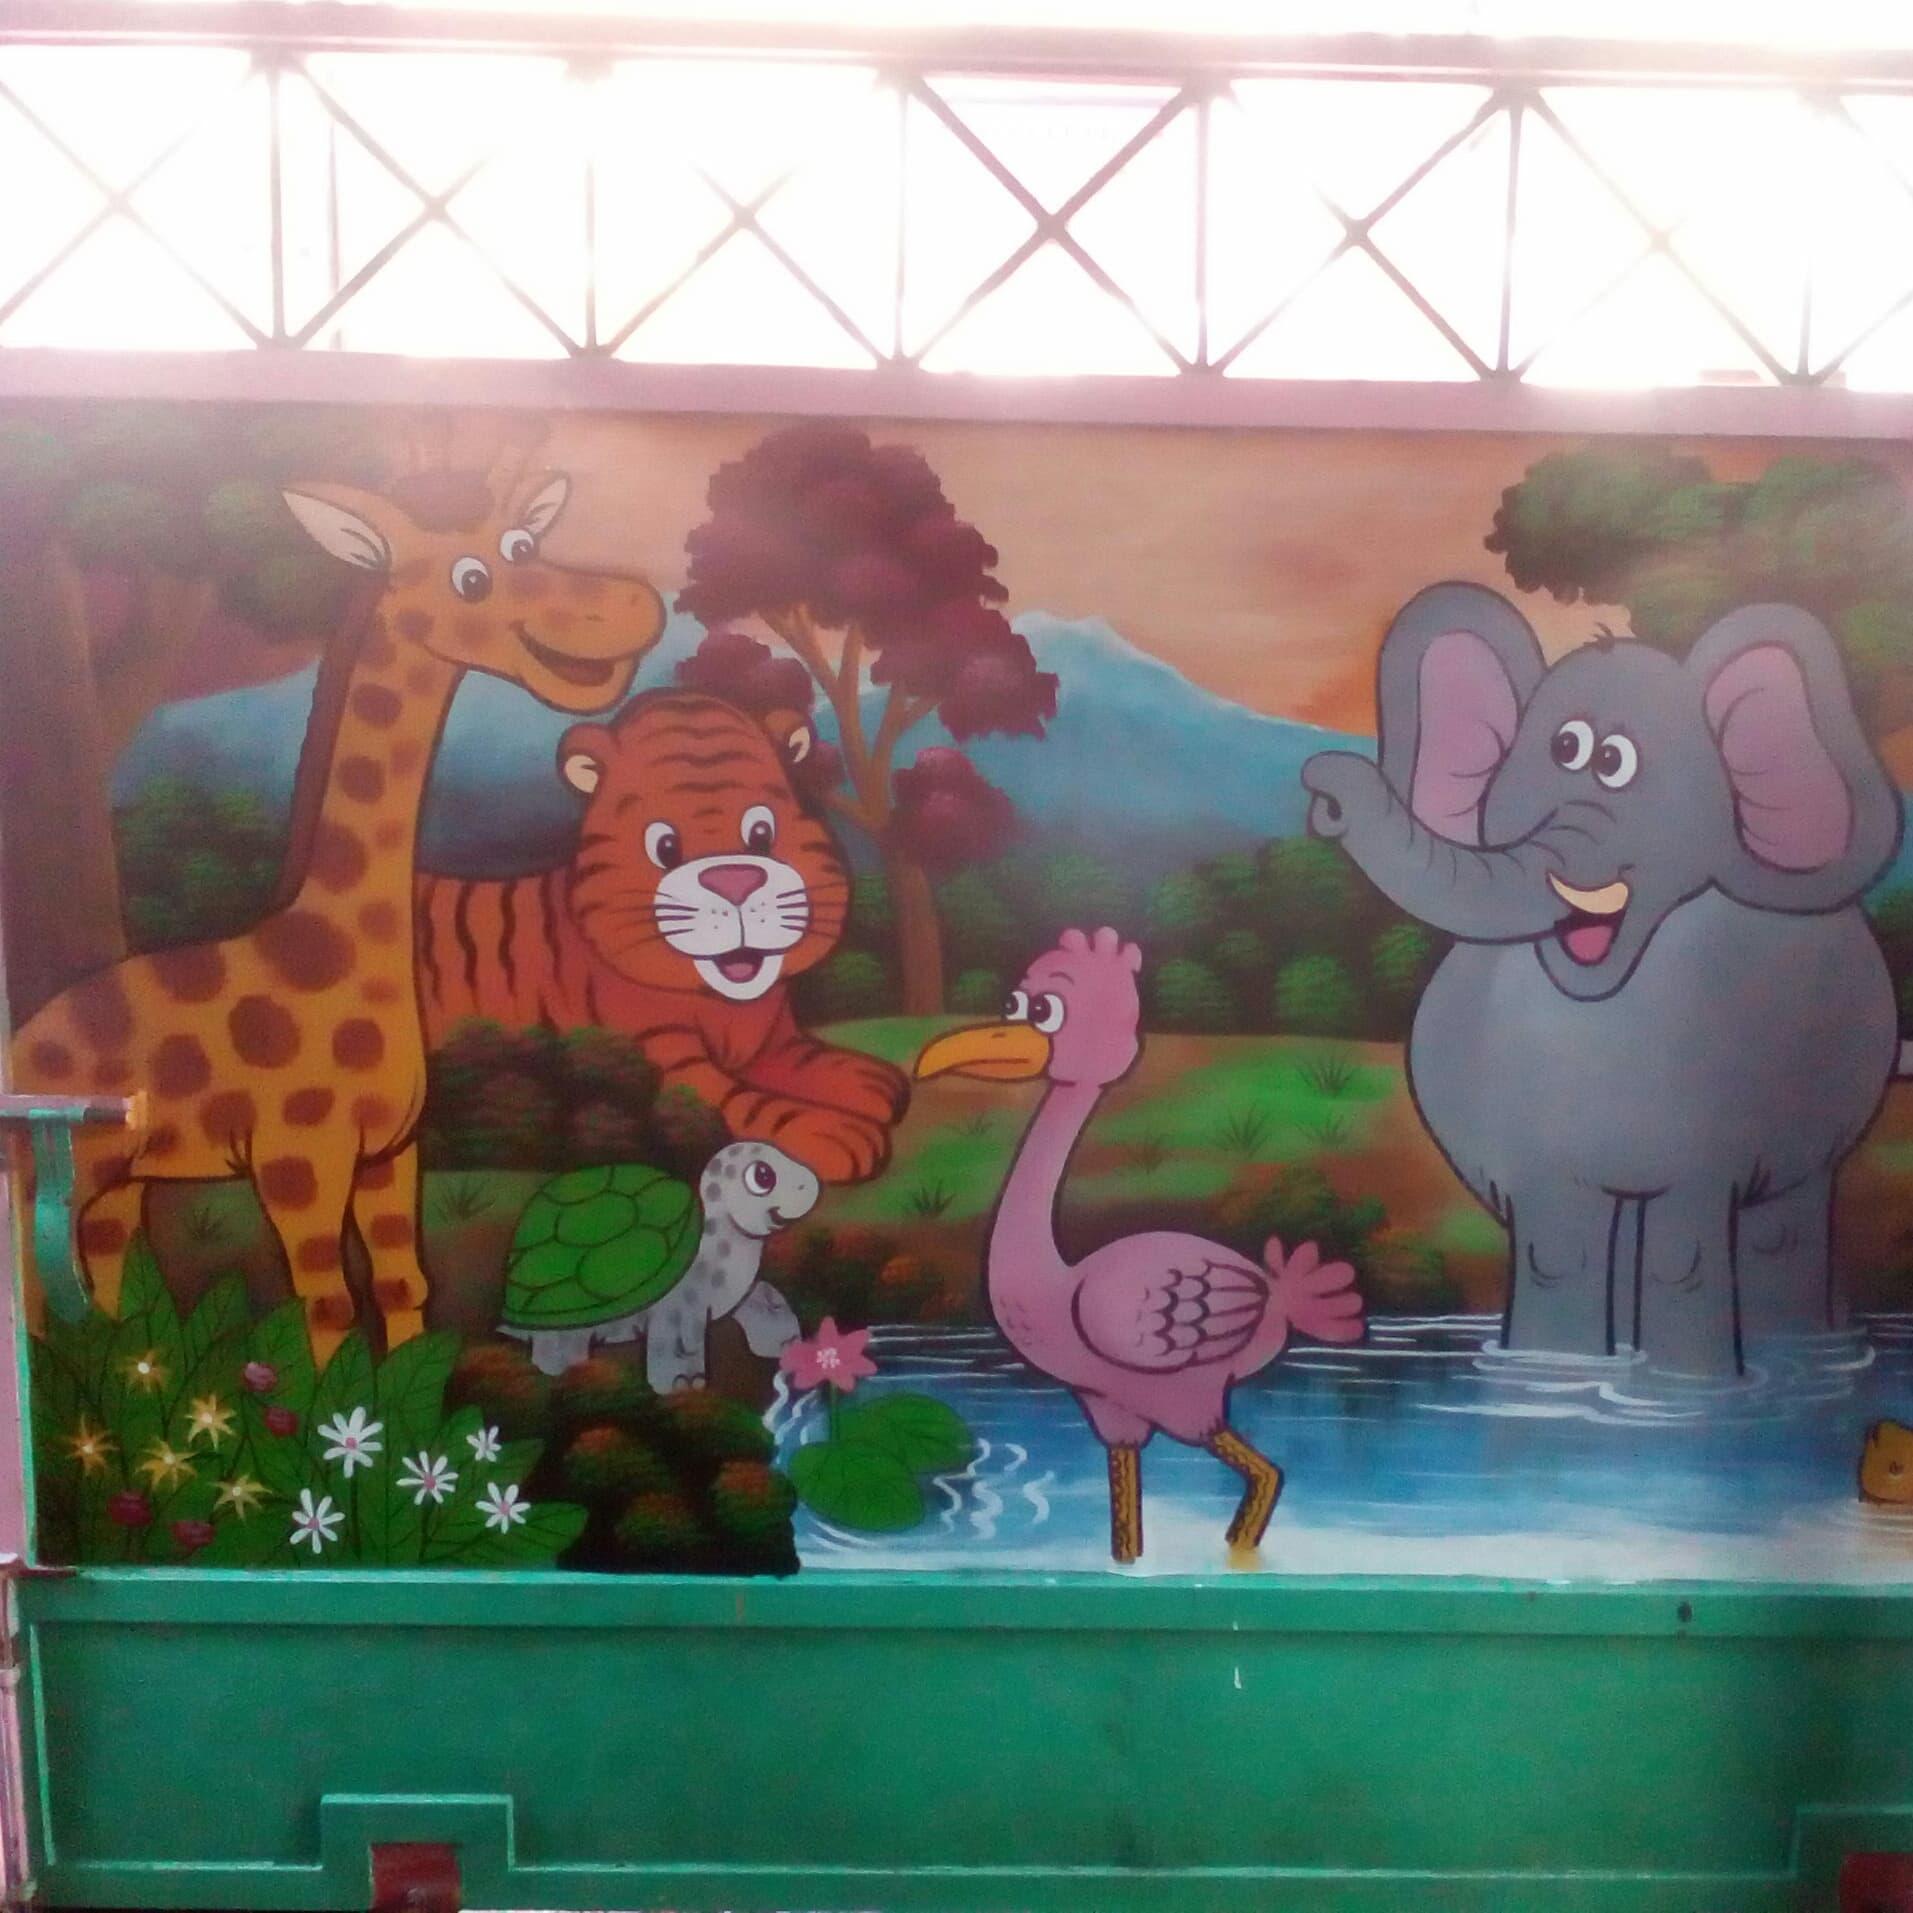 Lukisan Dinding Sekolah Tk Islami Cikimm Com